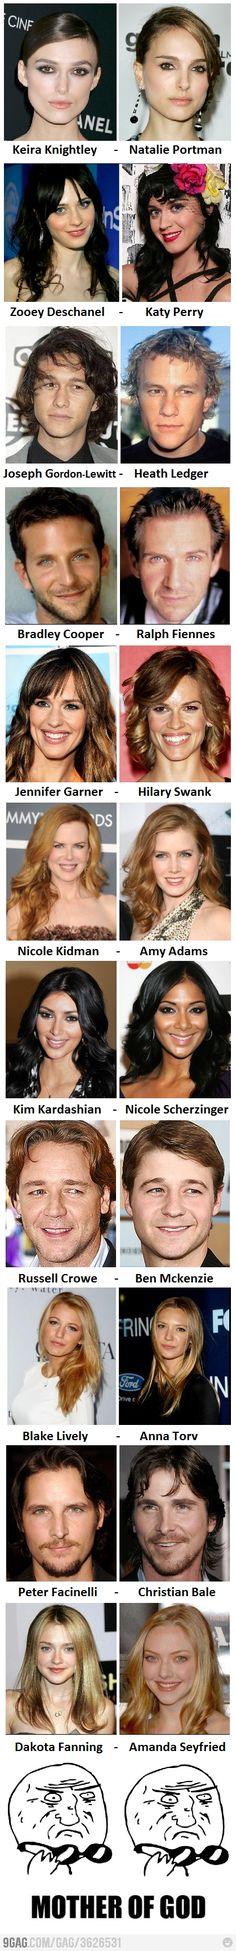 celebrity vs celebrity look alike hahaha :)